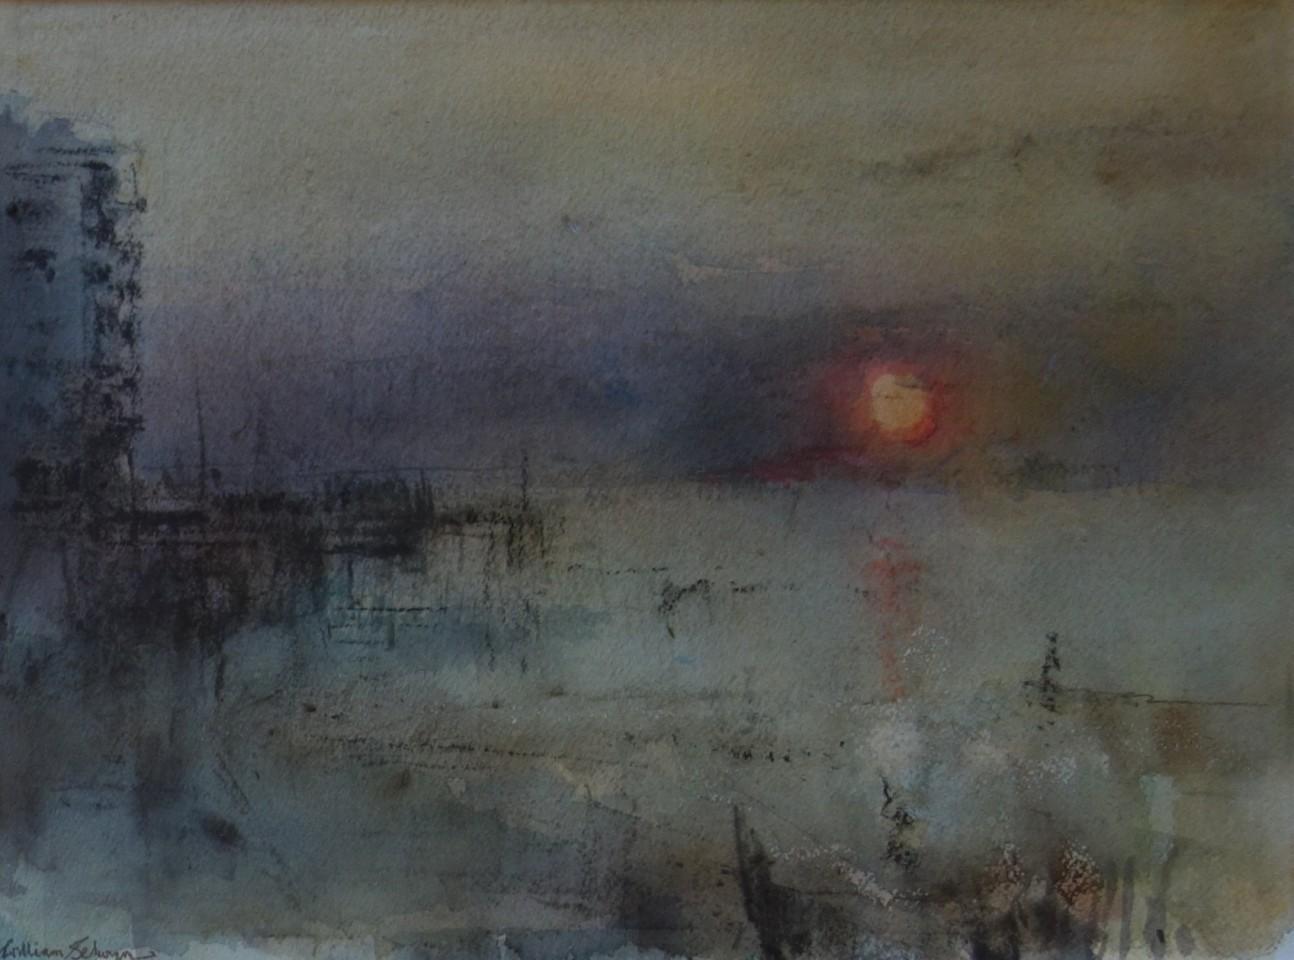 William Selwyn, Sunset, Victoria Dock